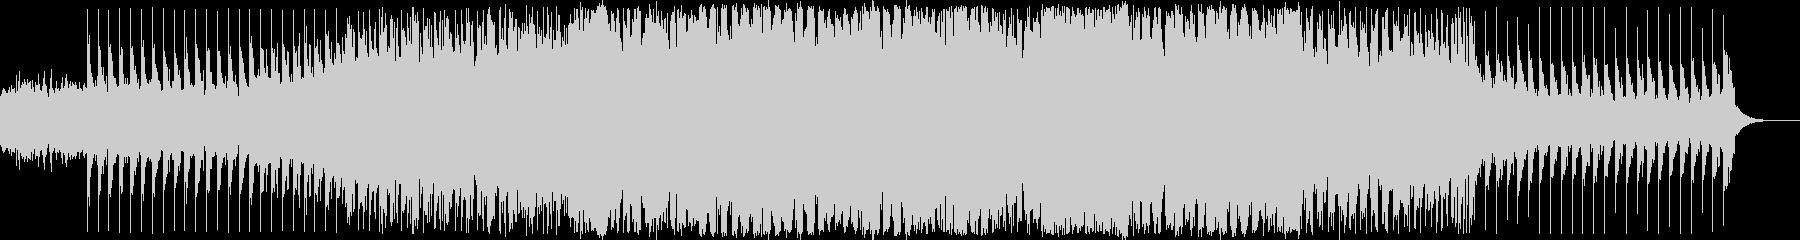 EDM系ダンスミュージックの未再生の波形